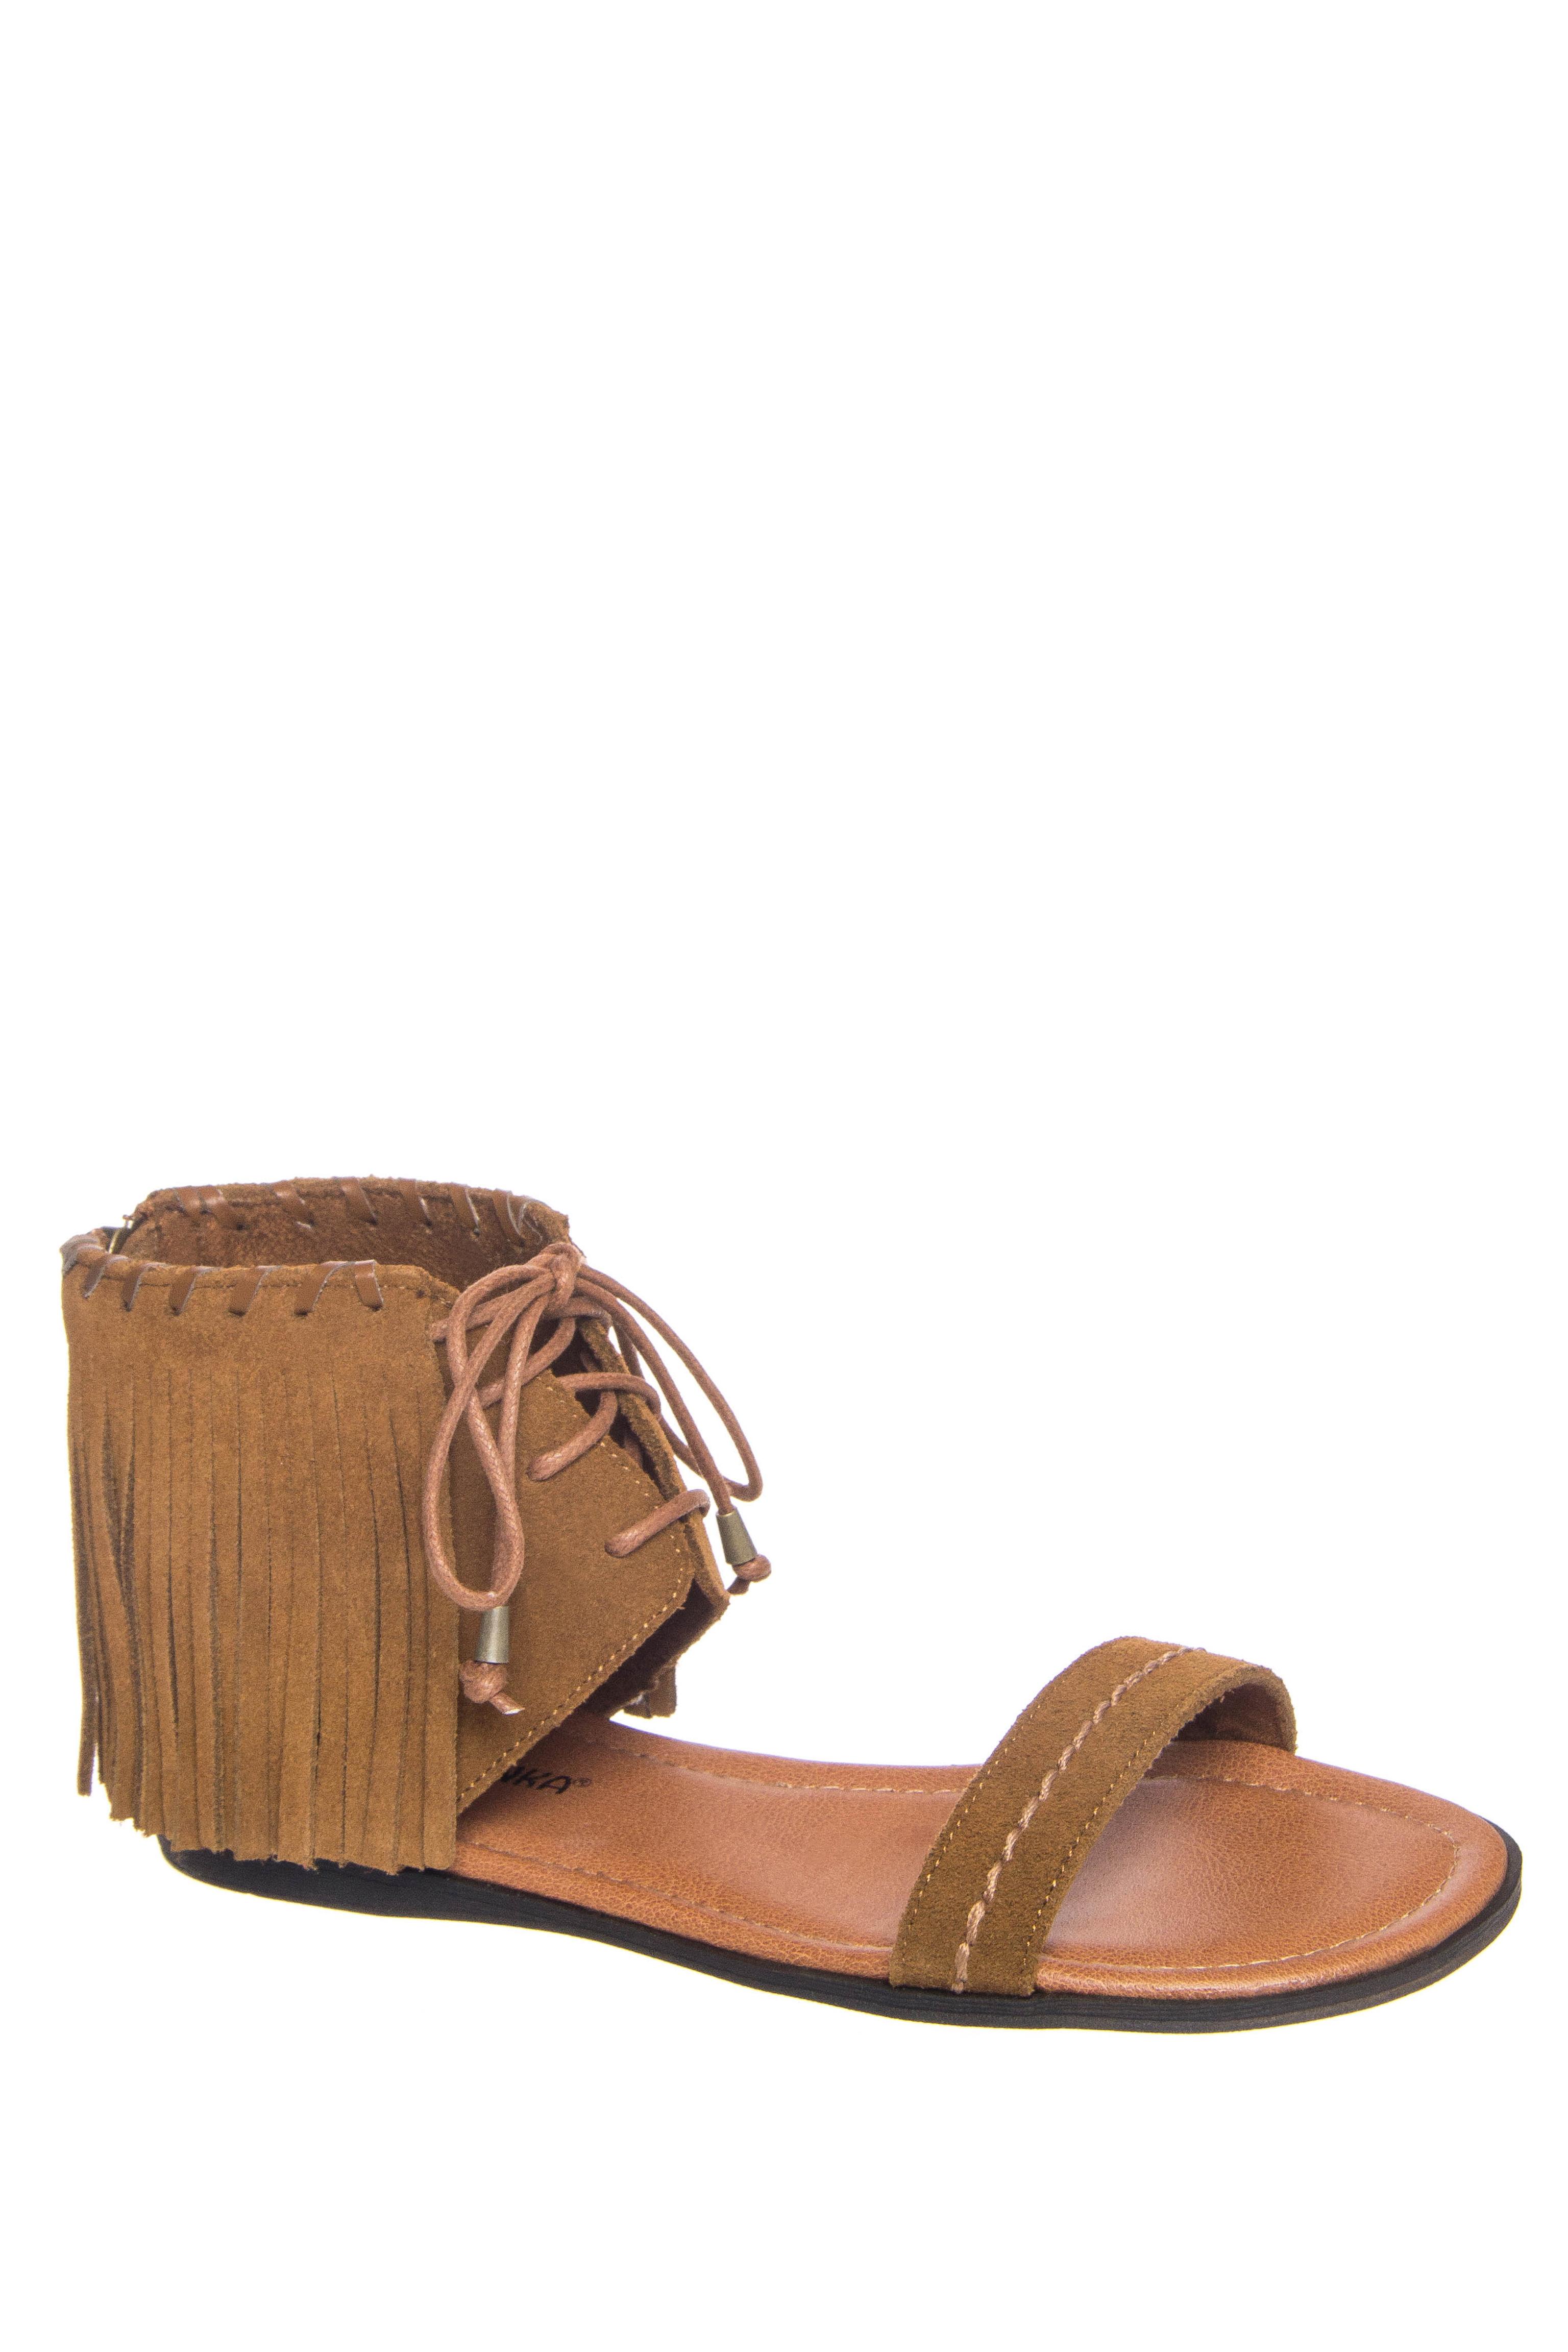 Minnetonka Havana Fringe Sandals